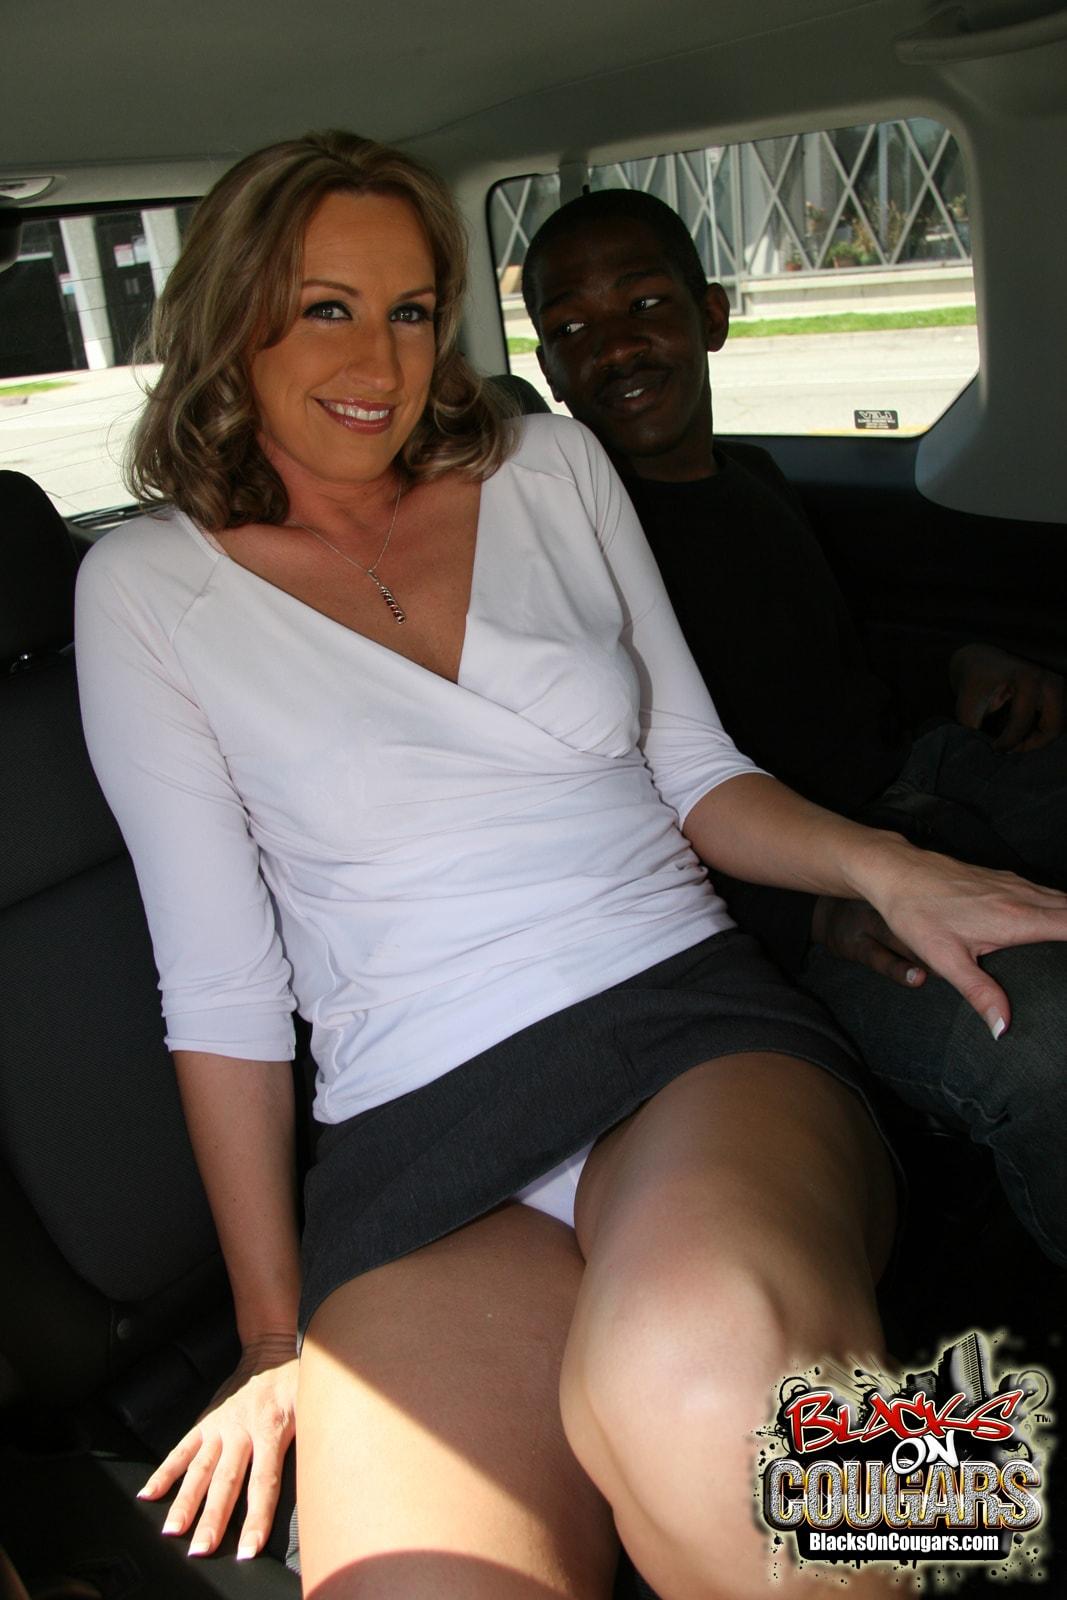 Dogfart '- Blacks On Cougars' starring Joey Lynn (Photo 4)